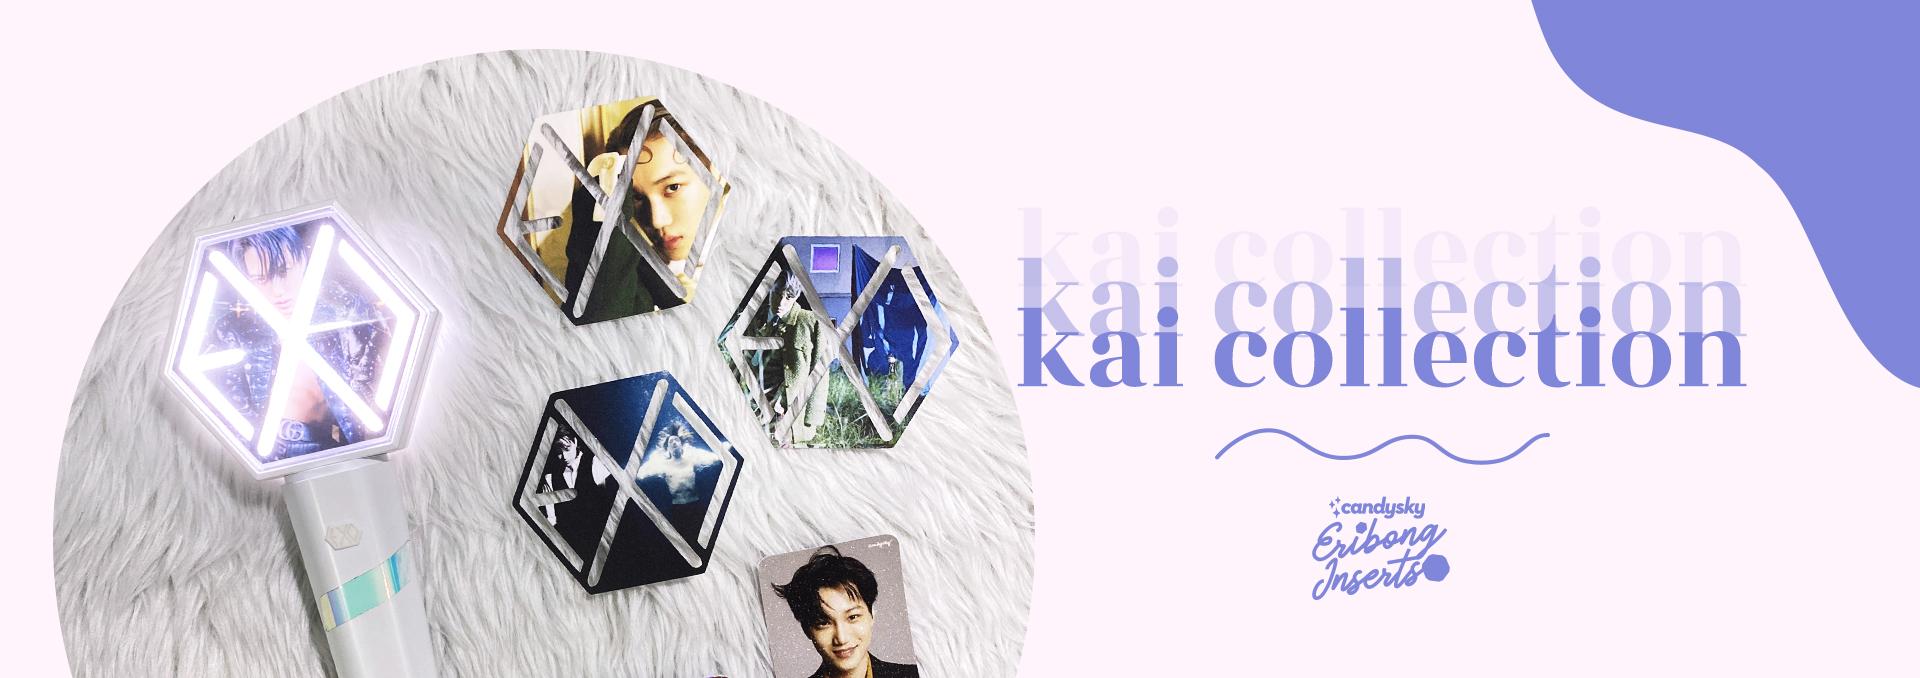 Eribong Inserts KAI Collection